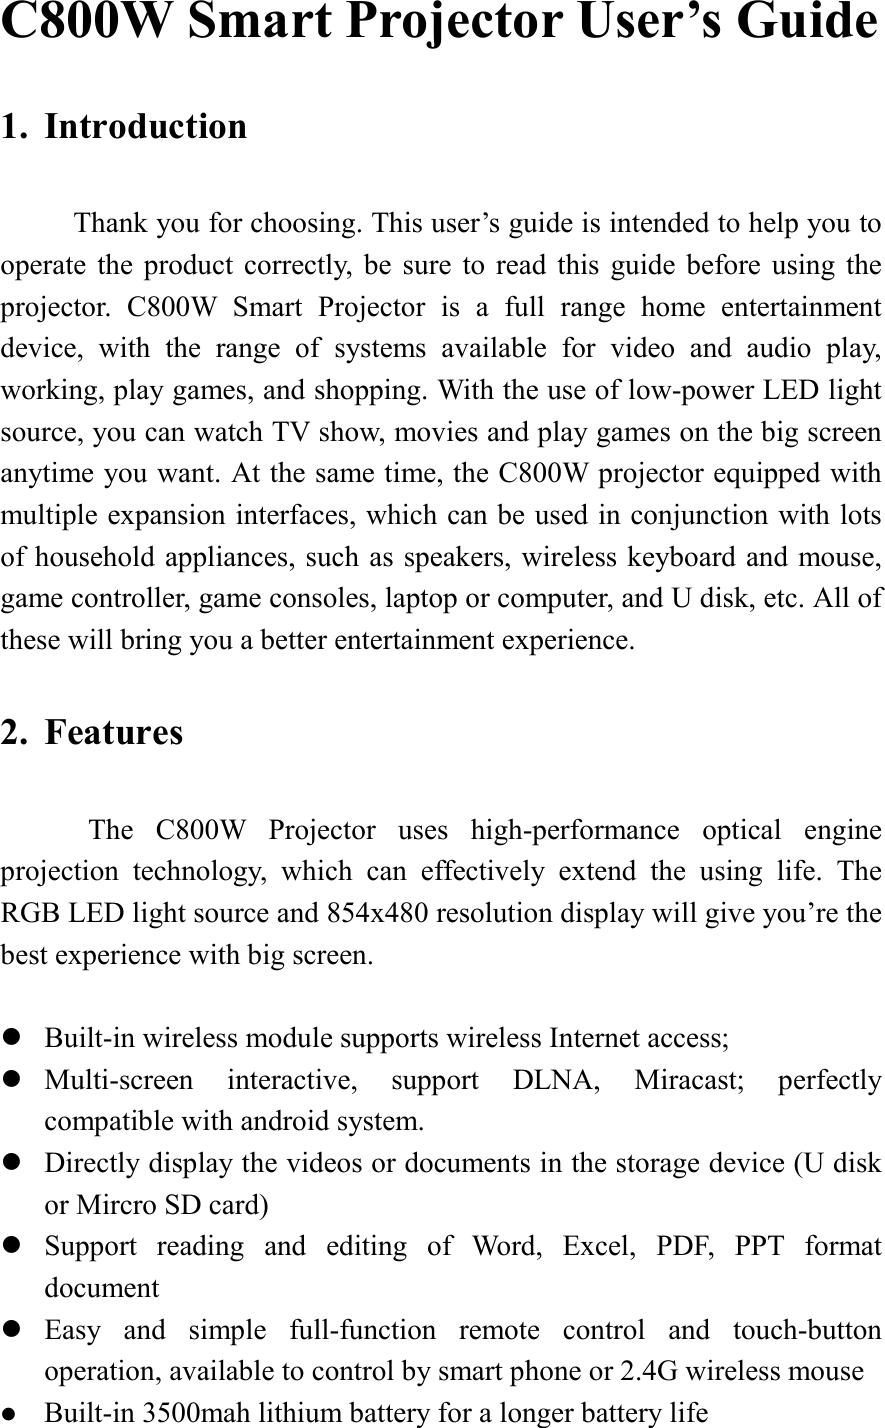 video game instruction manual pdf web site